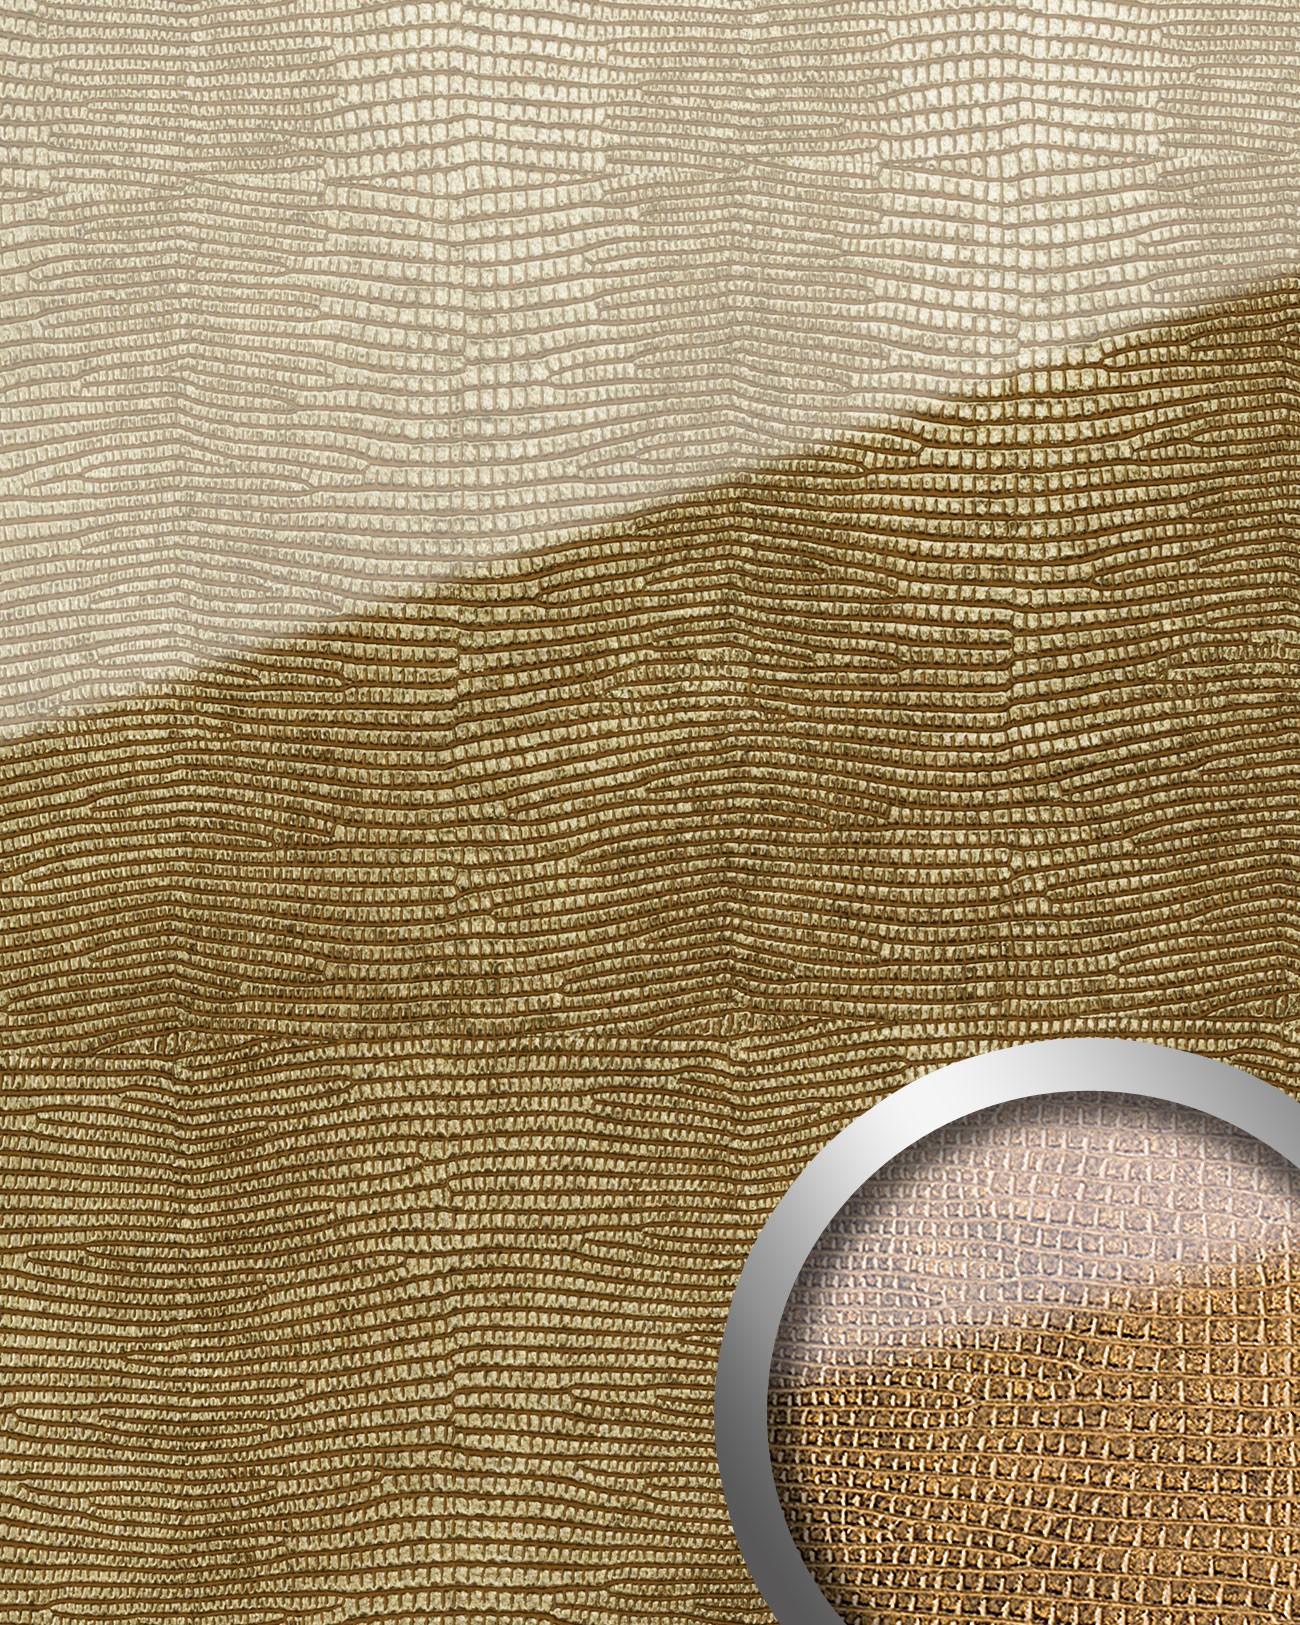 wandpaneel glas optik wallface 16973 leguan luxus dekor wandverkleidung selbstklebend gold braun. Black Bedroom Furniture Sets. Home Design Ideas